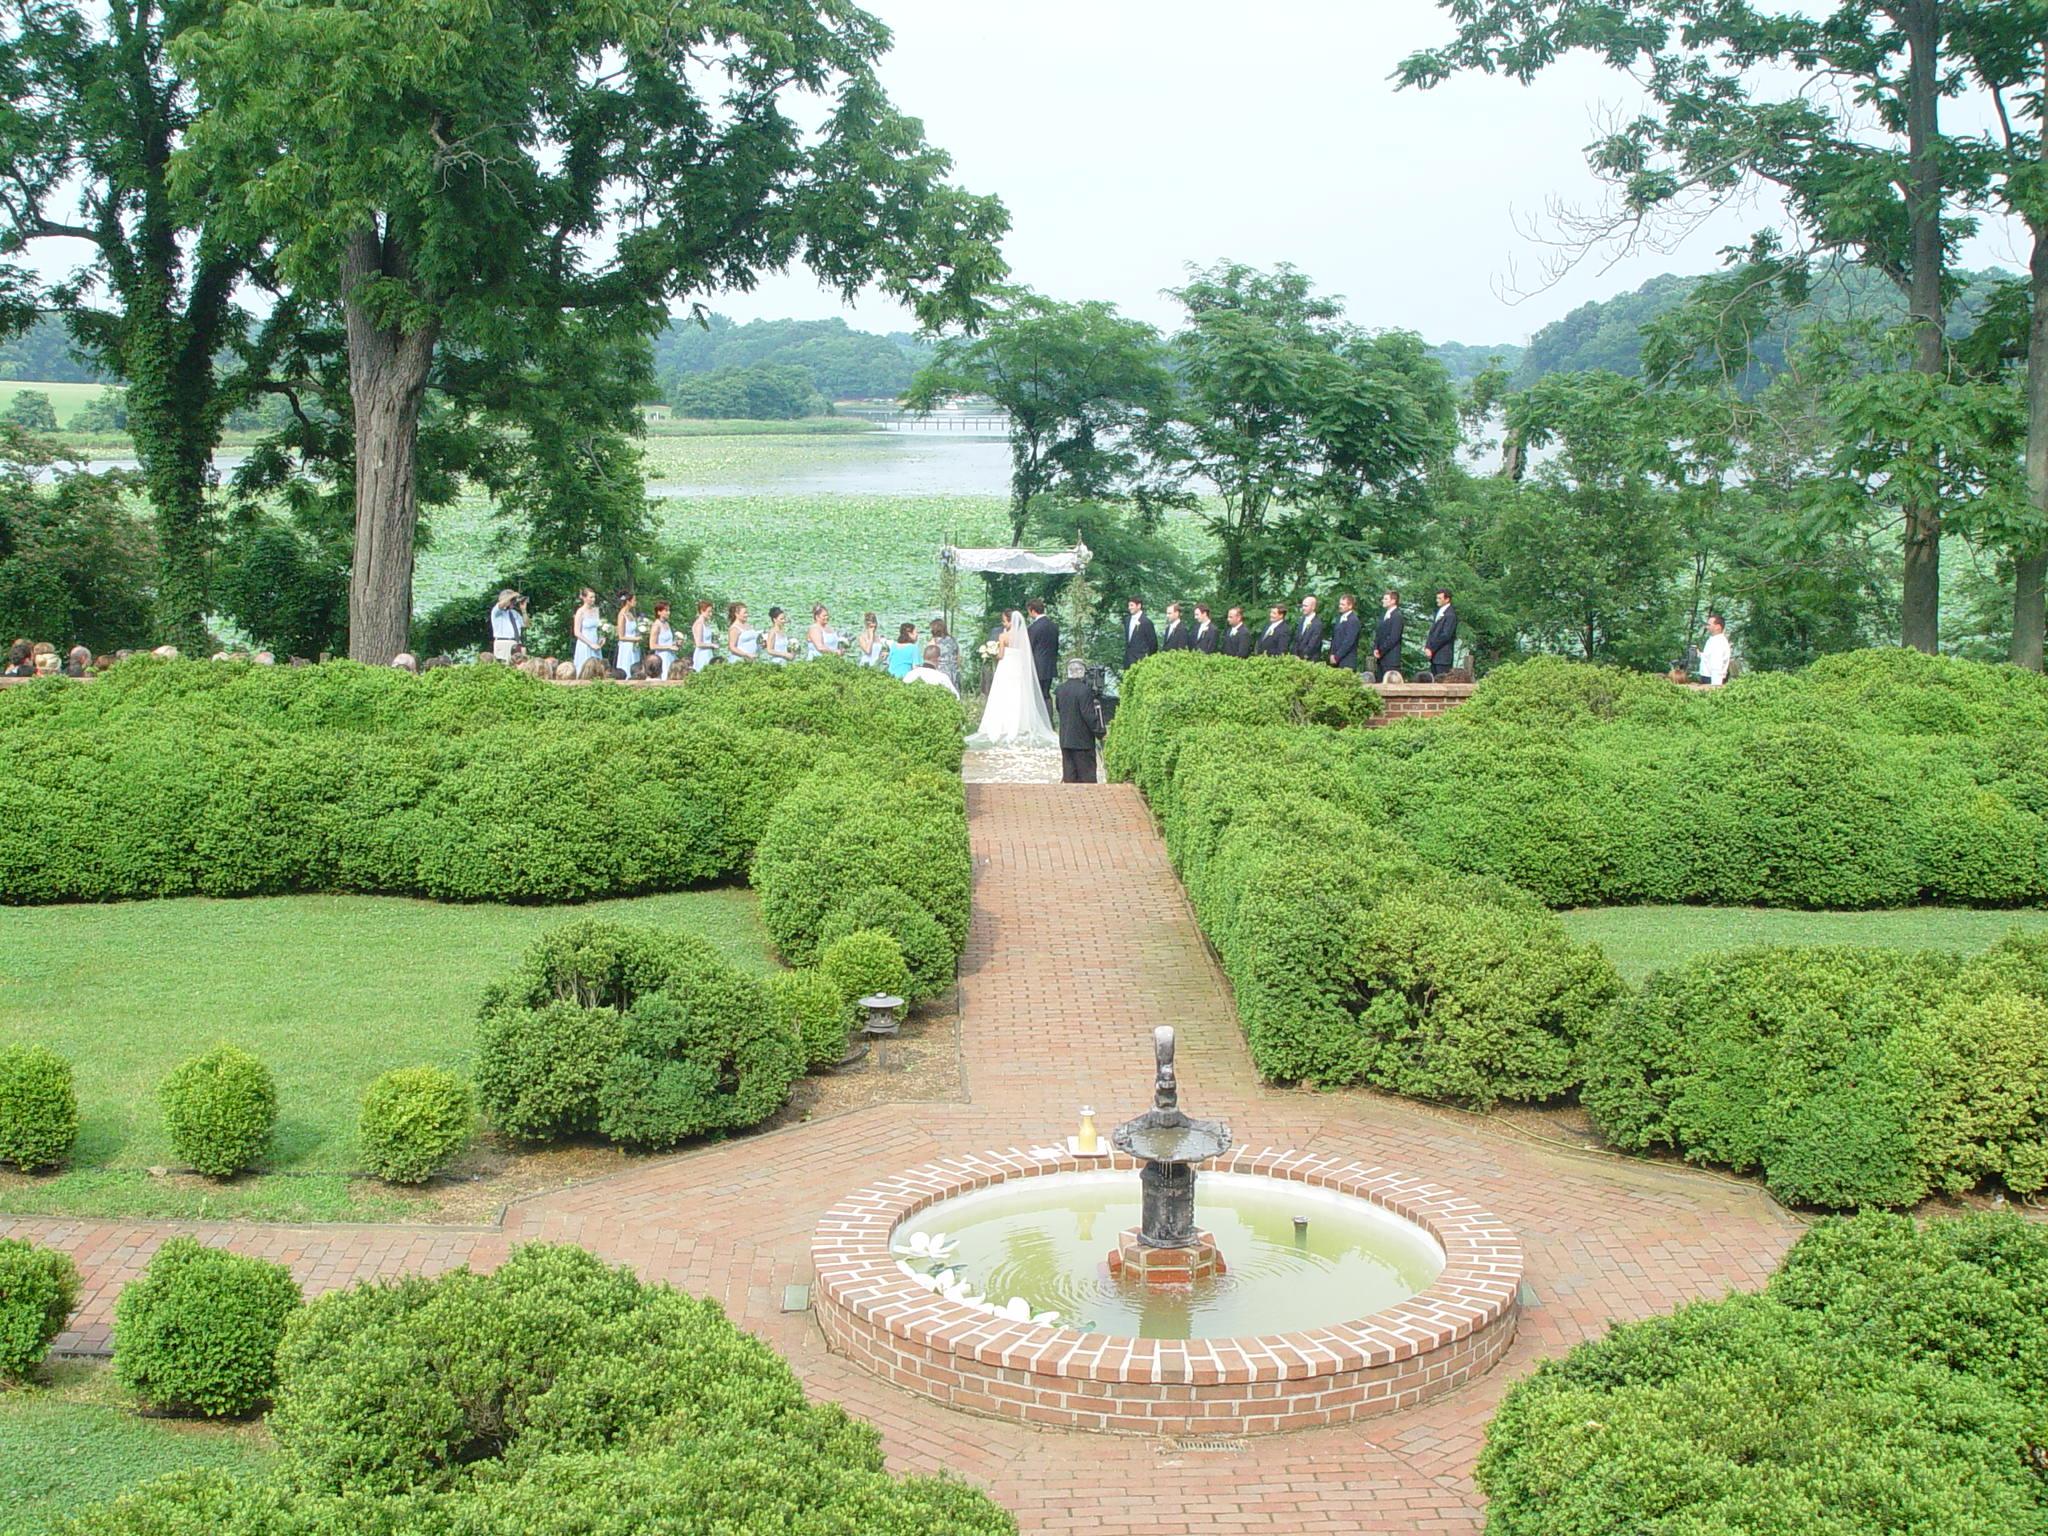 4-Britton-Corwin-wedding-6-19-04-019